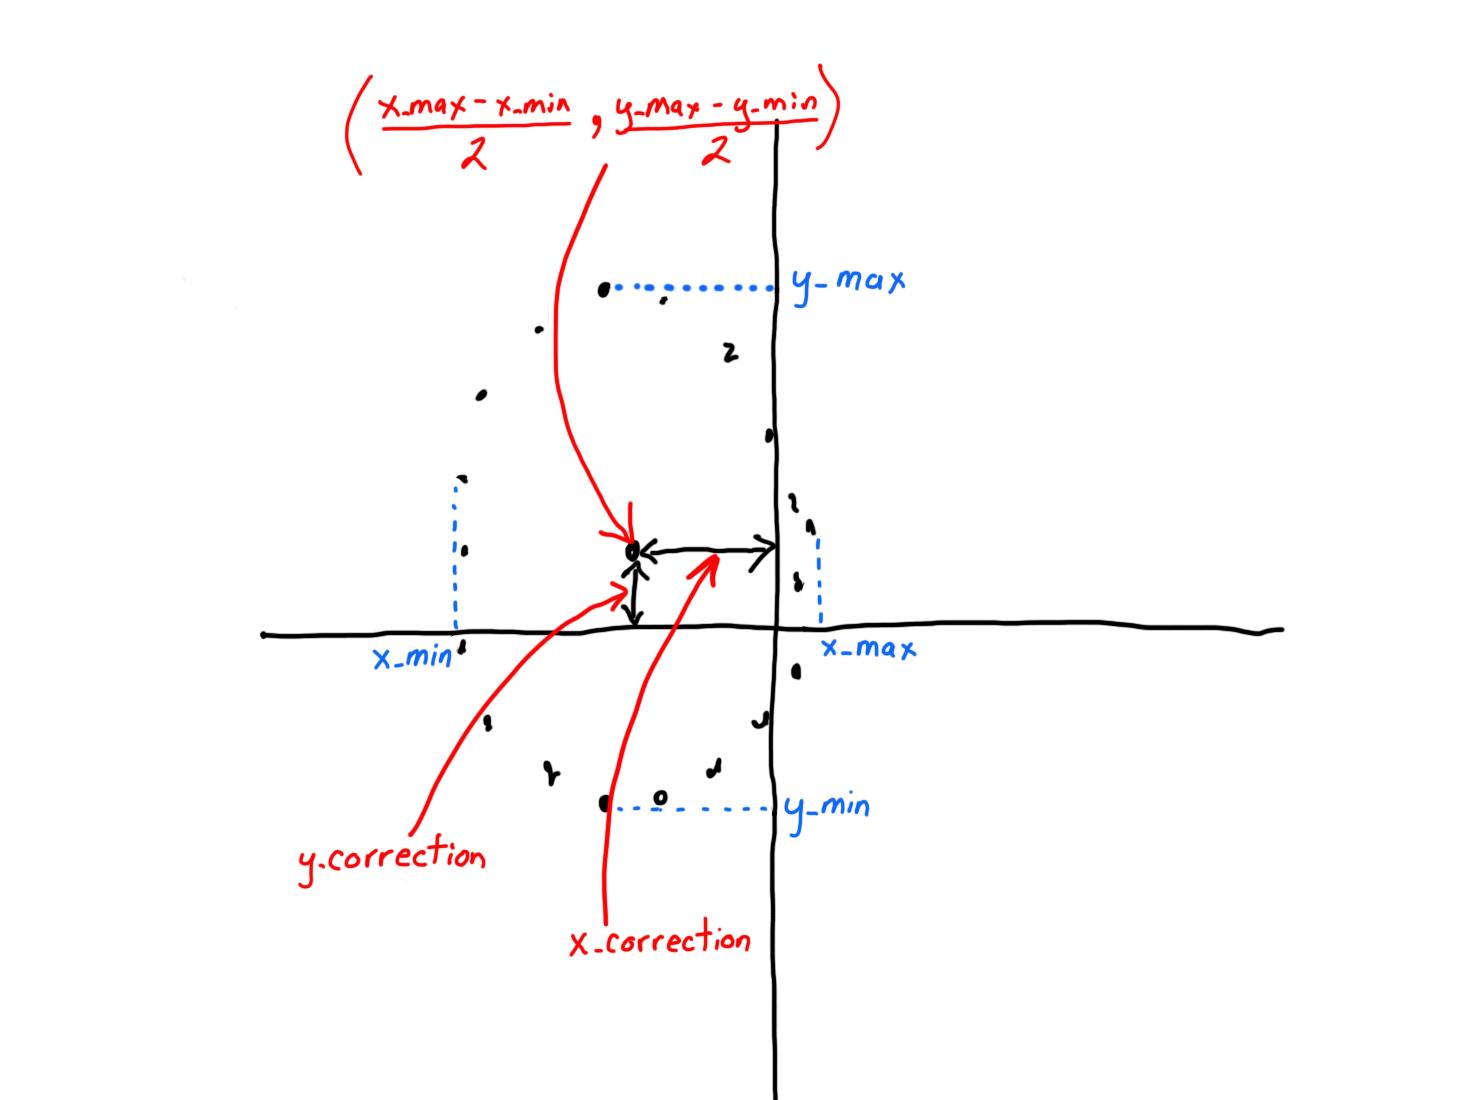 circuitpython_correction.png